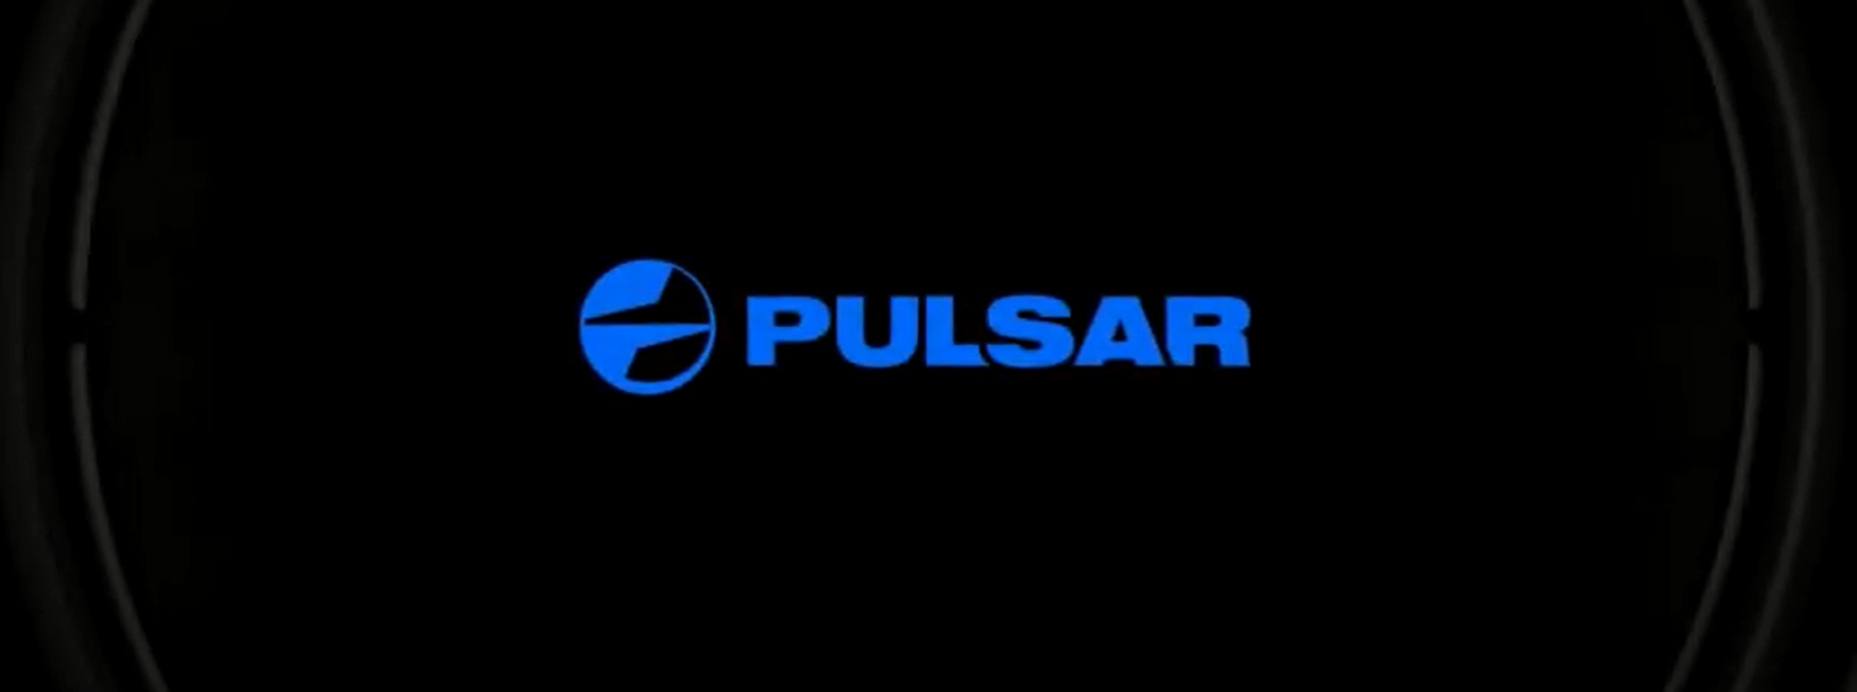 Pulsar Digex